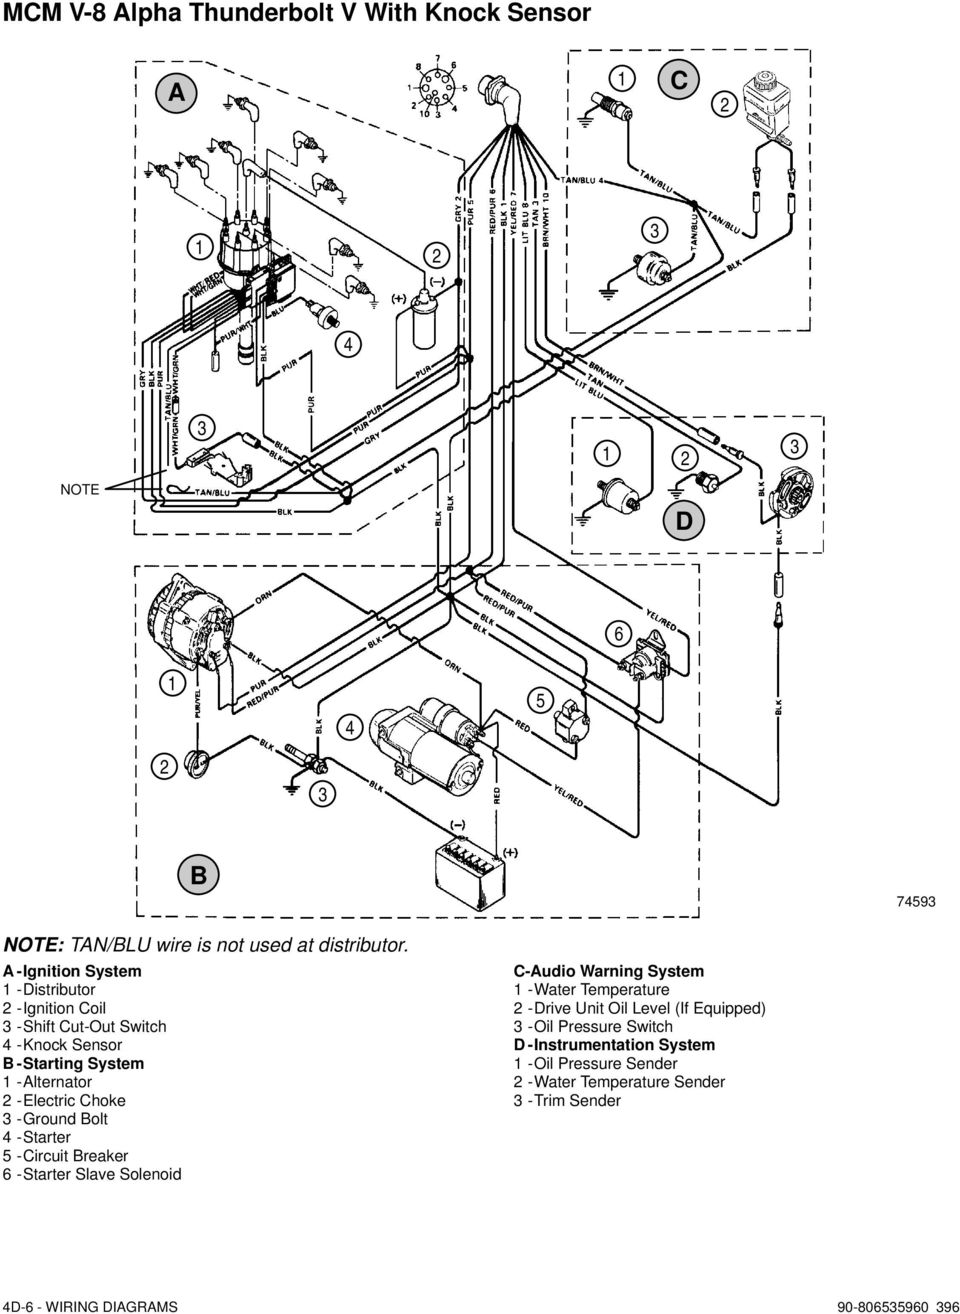 hight resolution of  ground olt starter ircuit reaker starter slave solenoid udio warning system